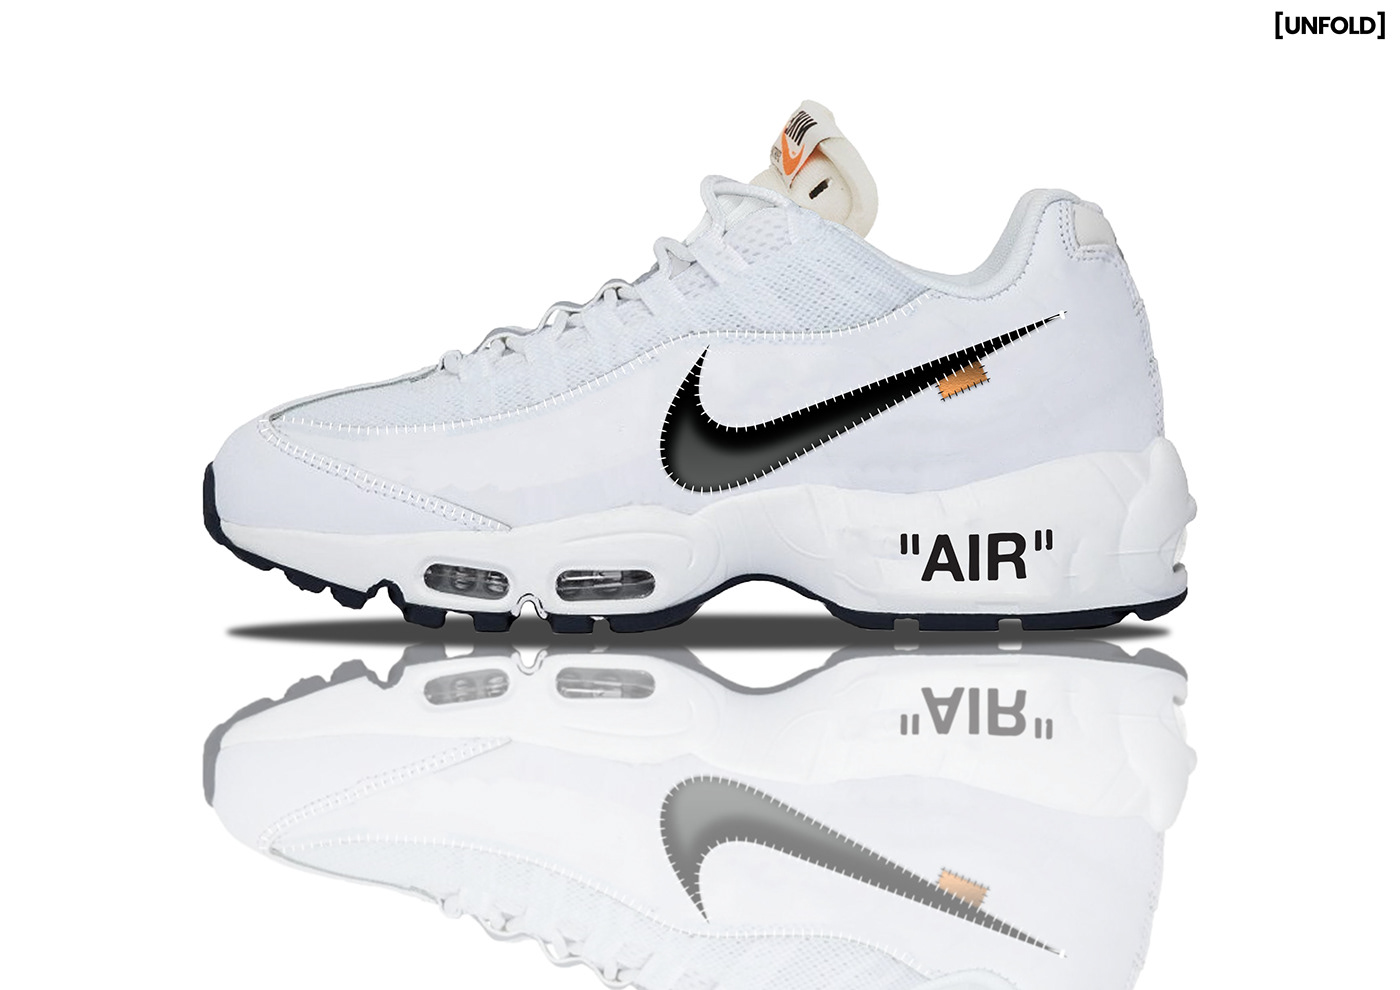 f1fcc900cf4c Off-White X Nike Air Max 95 Concept on Behance